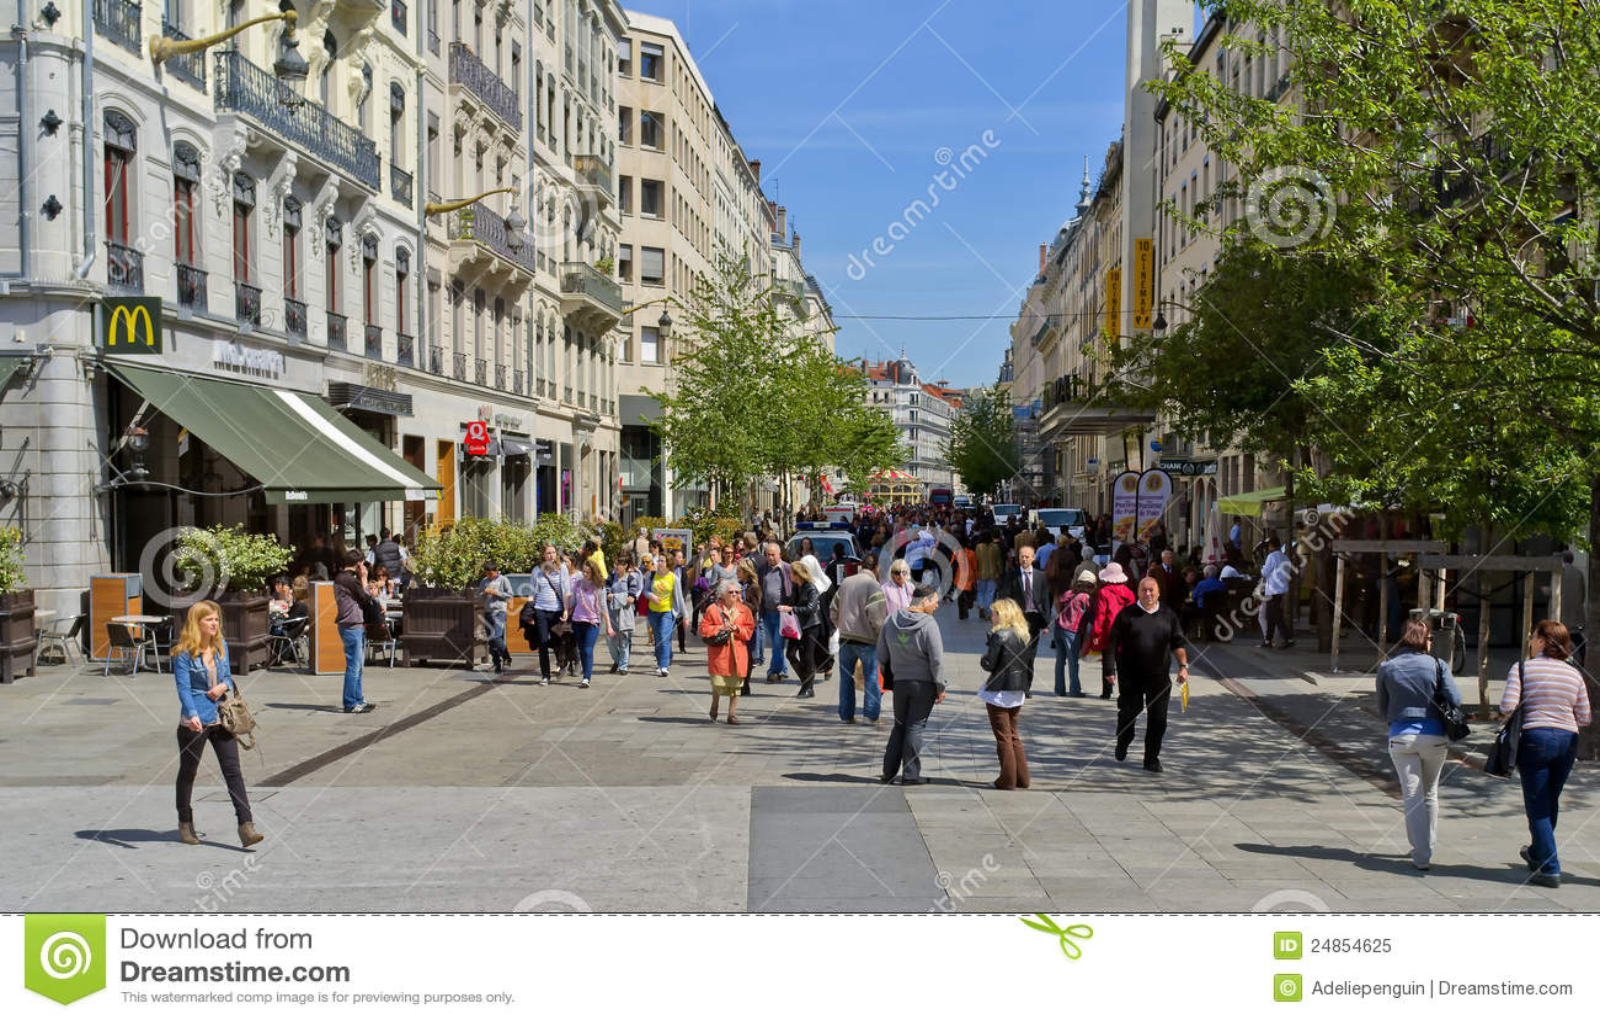 Shopping street lyon france editorial image image of for Audiovisuel exterieur de la france